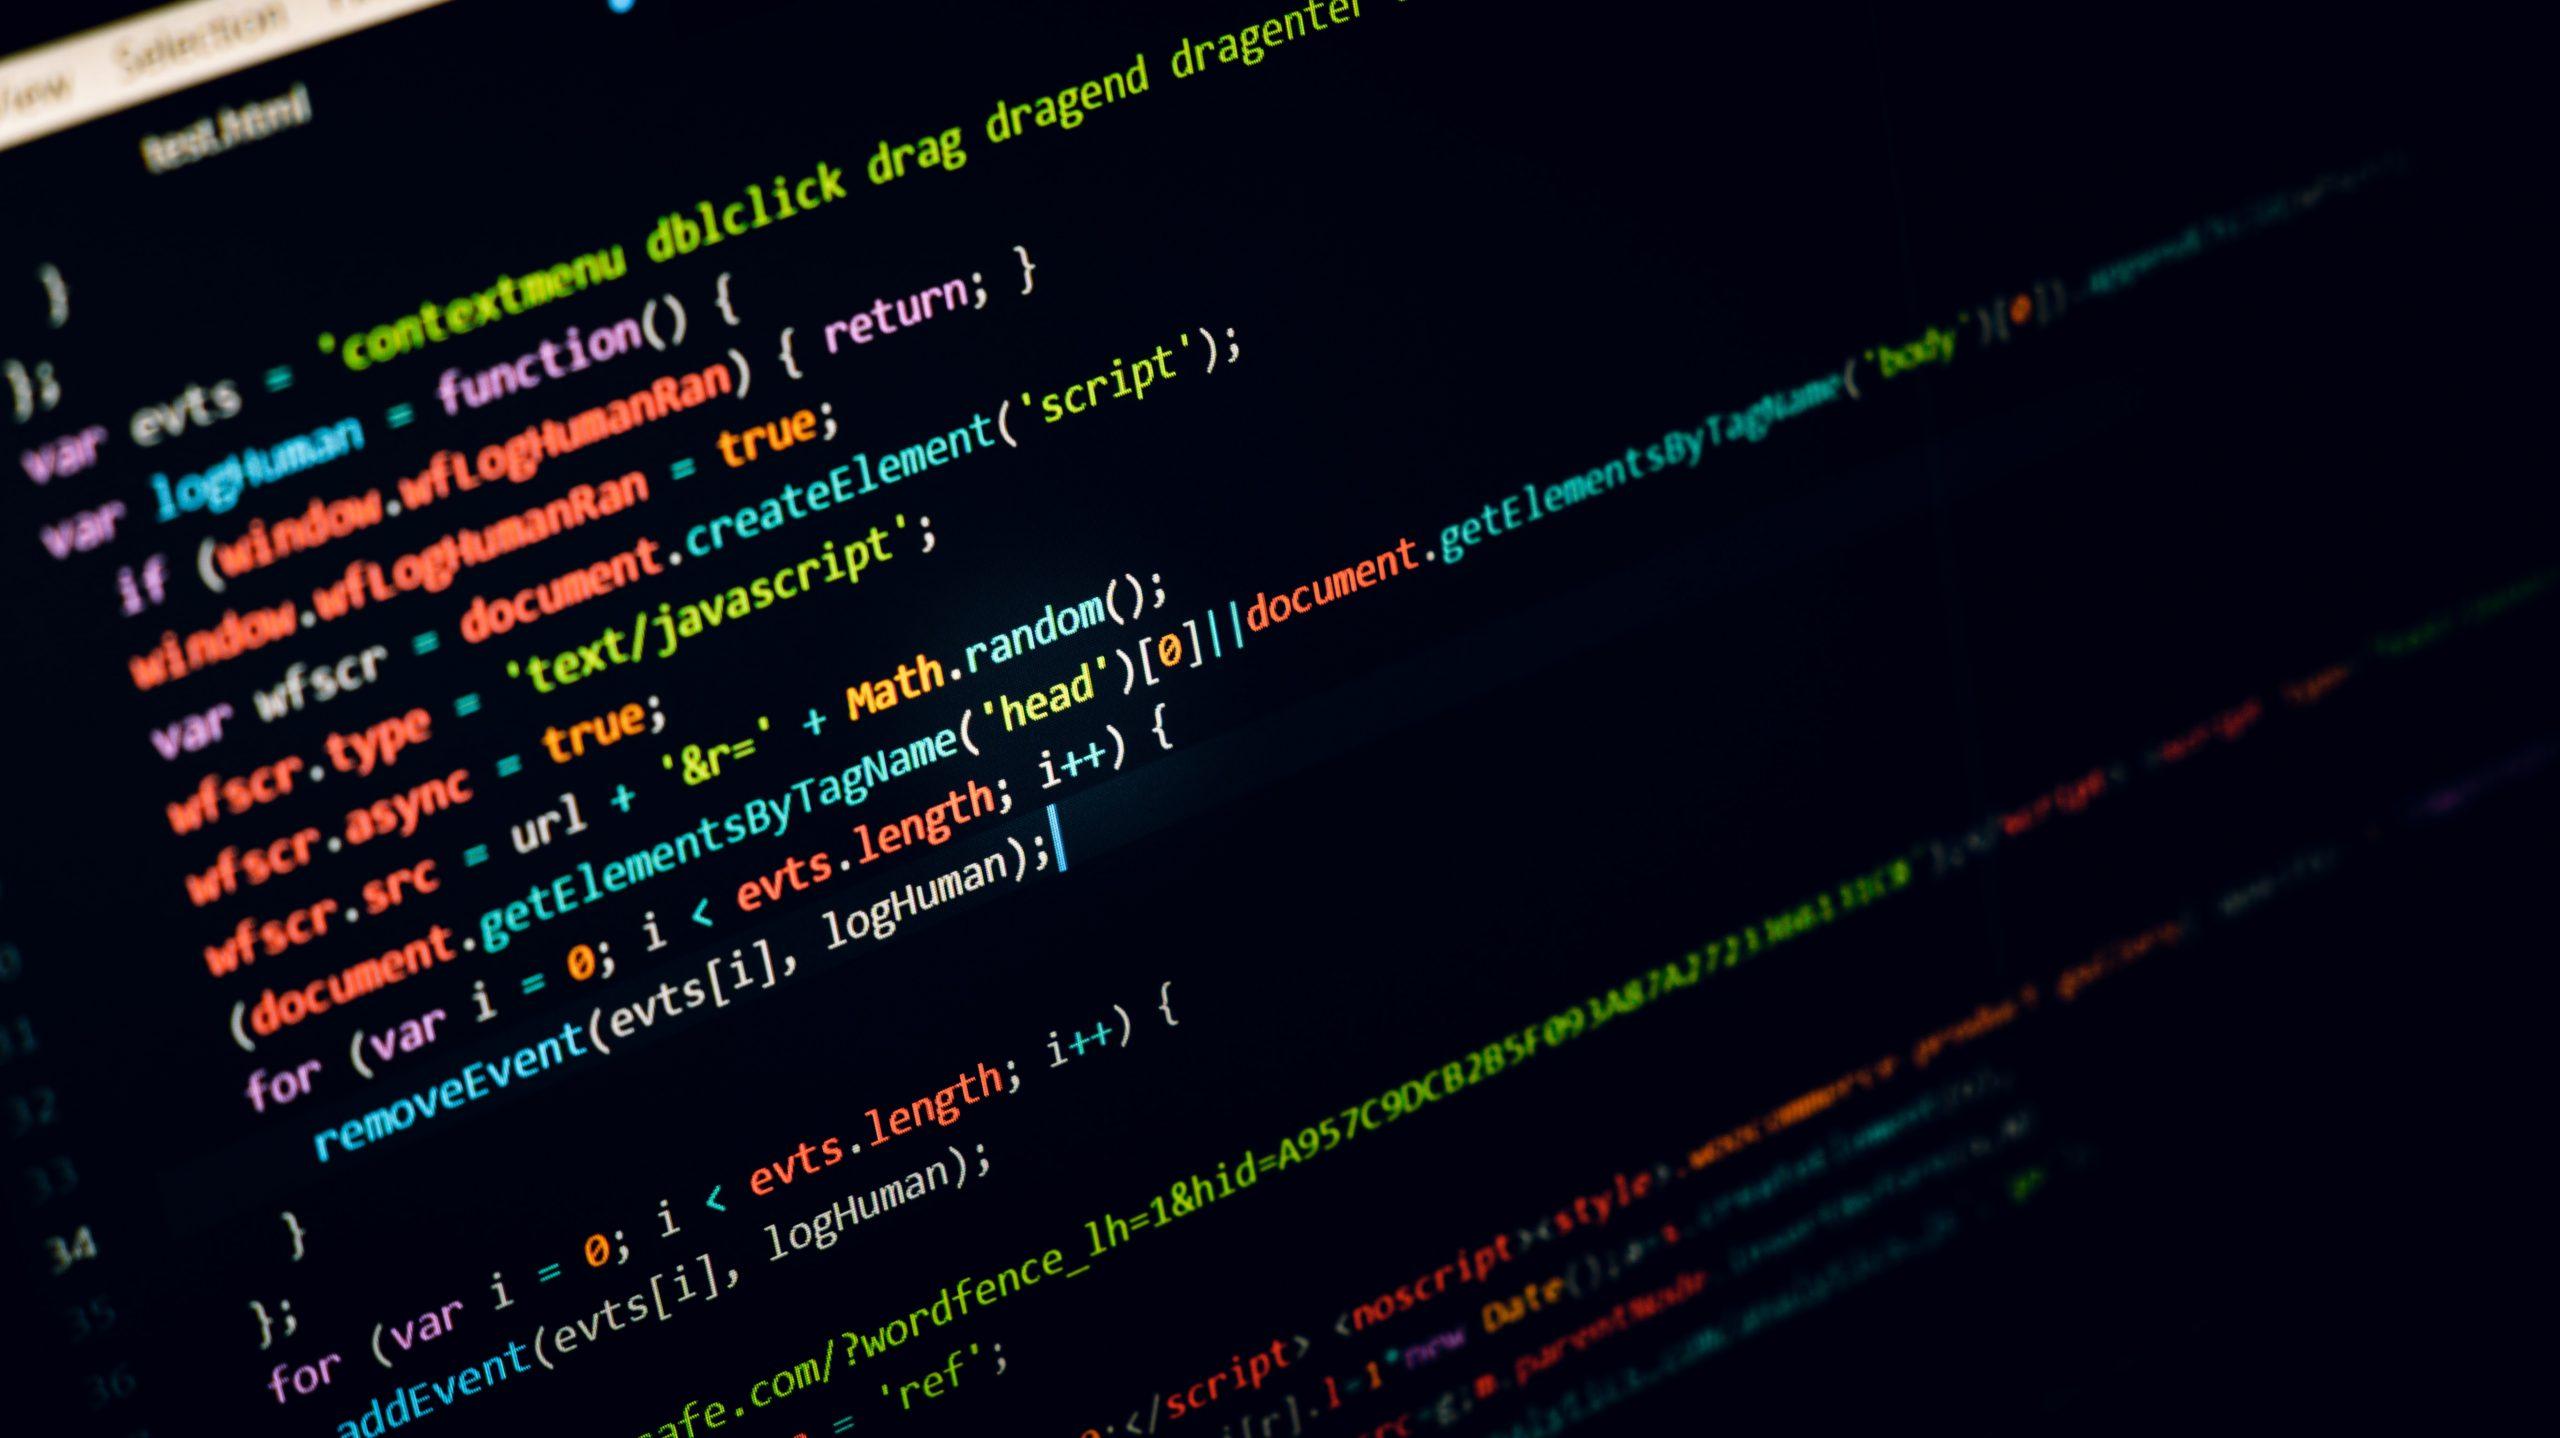 Hacking The Box (HTB) vs VulnHub